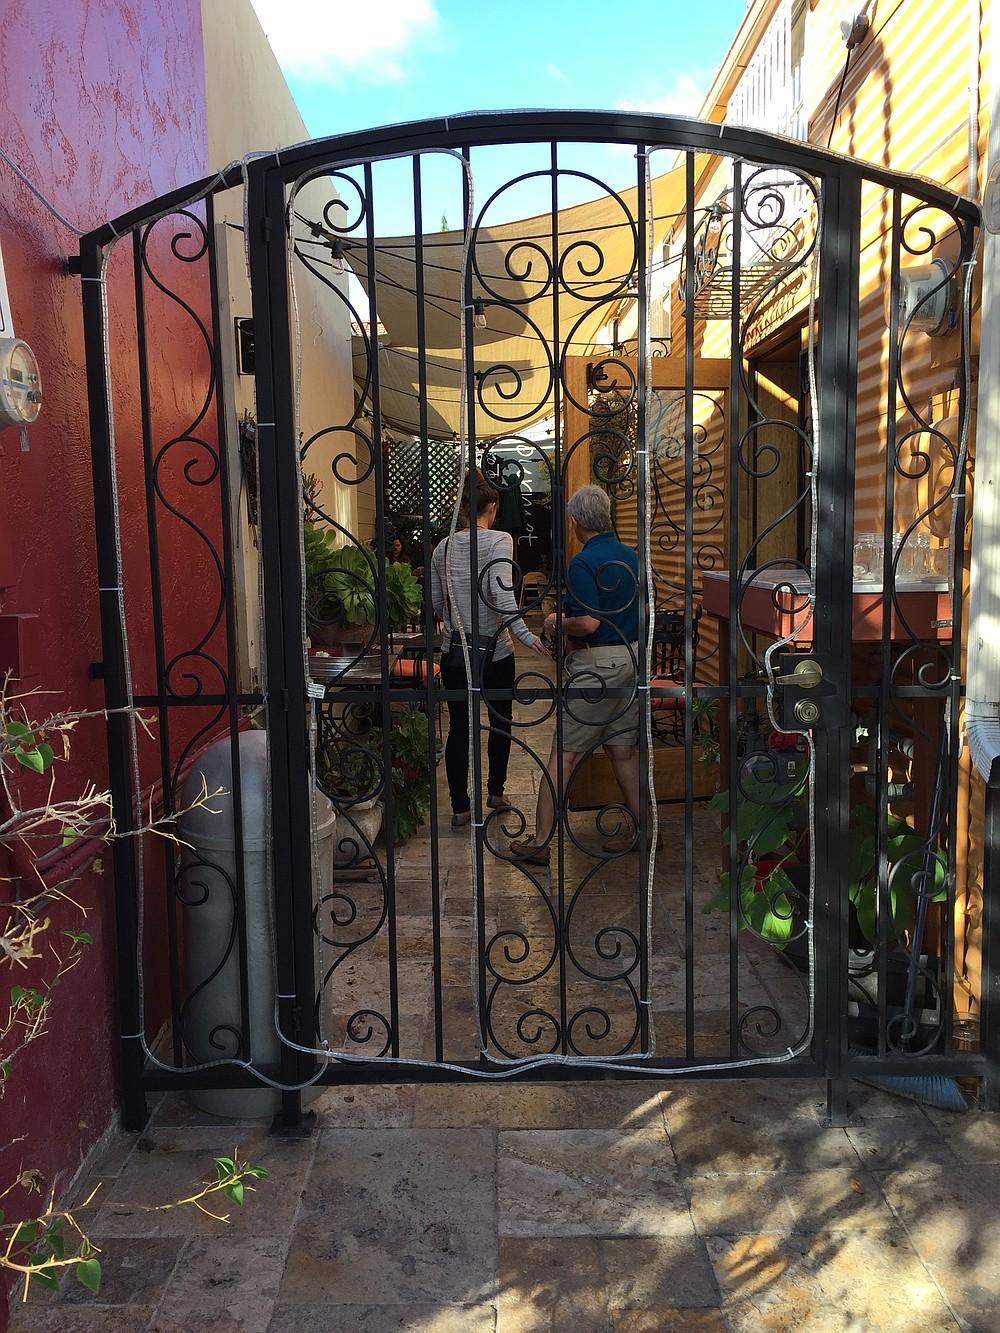 A side patio for those who wish to dine al fresco